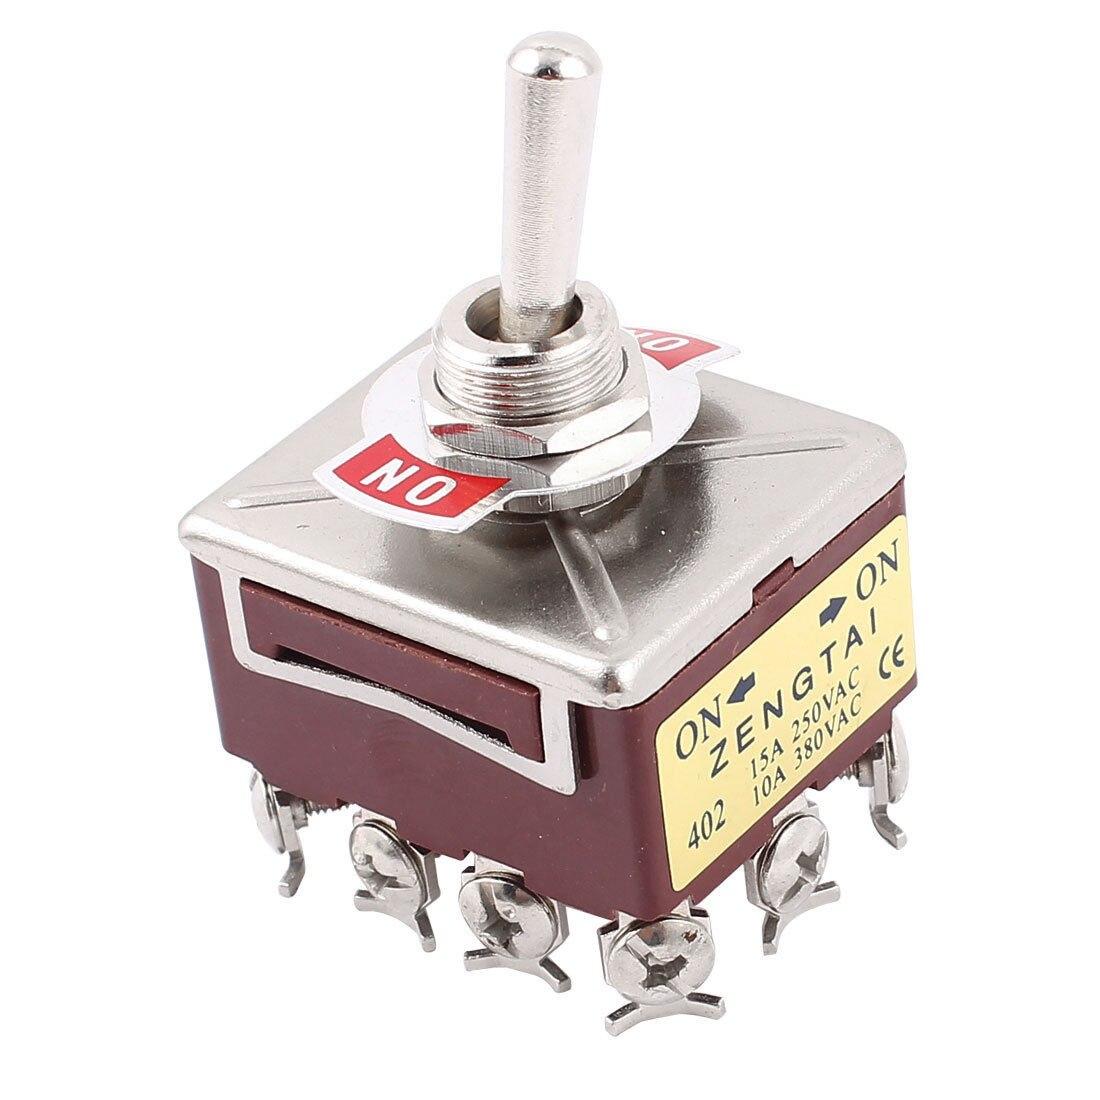 12 Screw Terminals On/On 4PDT Toggle Switch AC15A/250V 10A/380V12 Screw Terminals On/On 4PDT Toggle Switch AC15A/250V 10A/380V